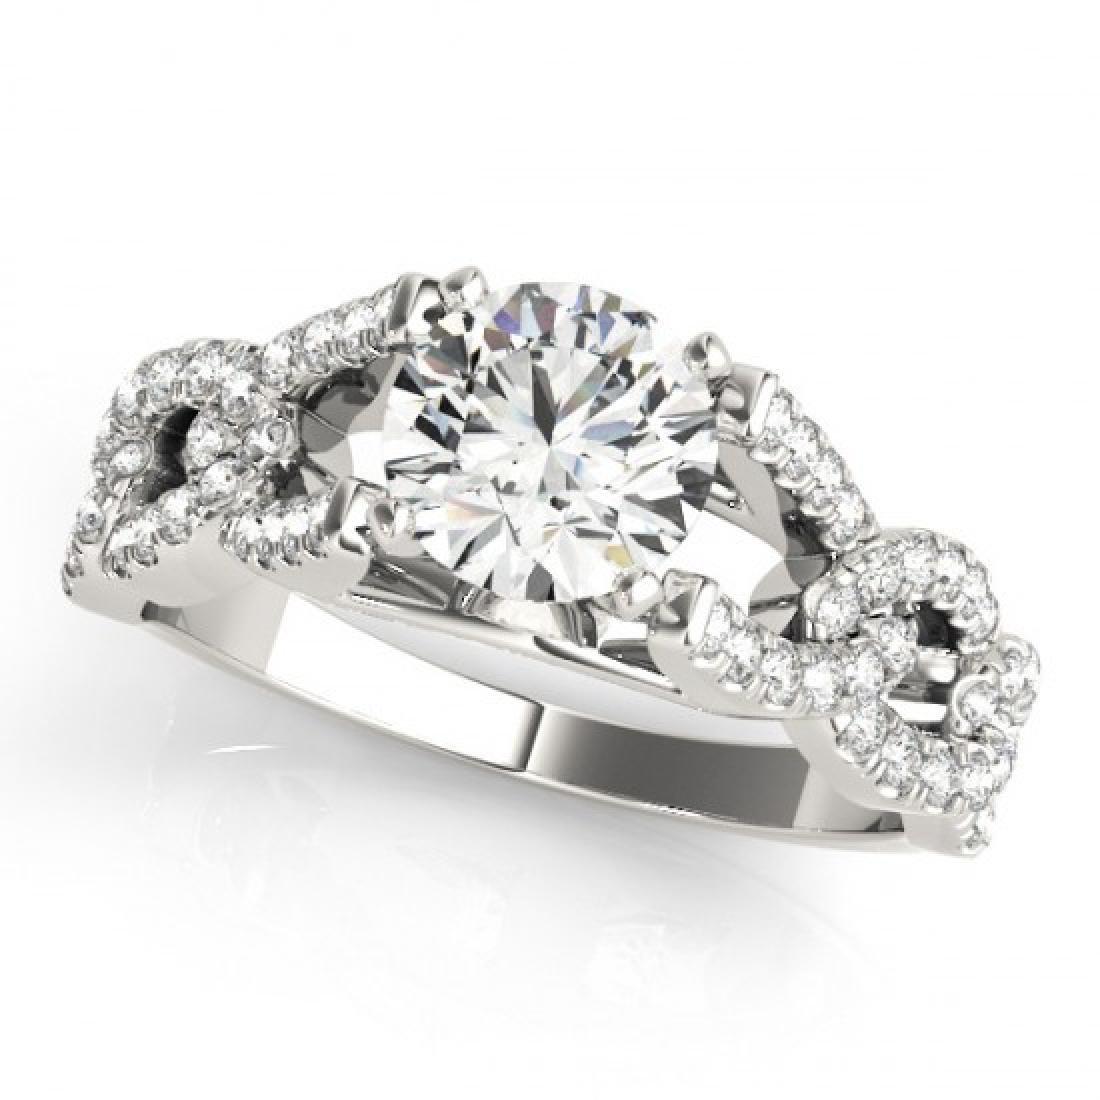 1 CTW Certified VS/SI Diamond Solitaire Ring 14K White - 2